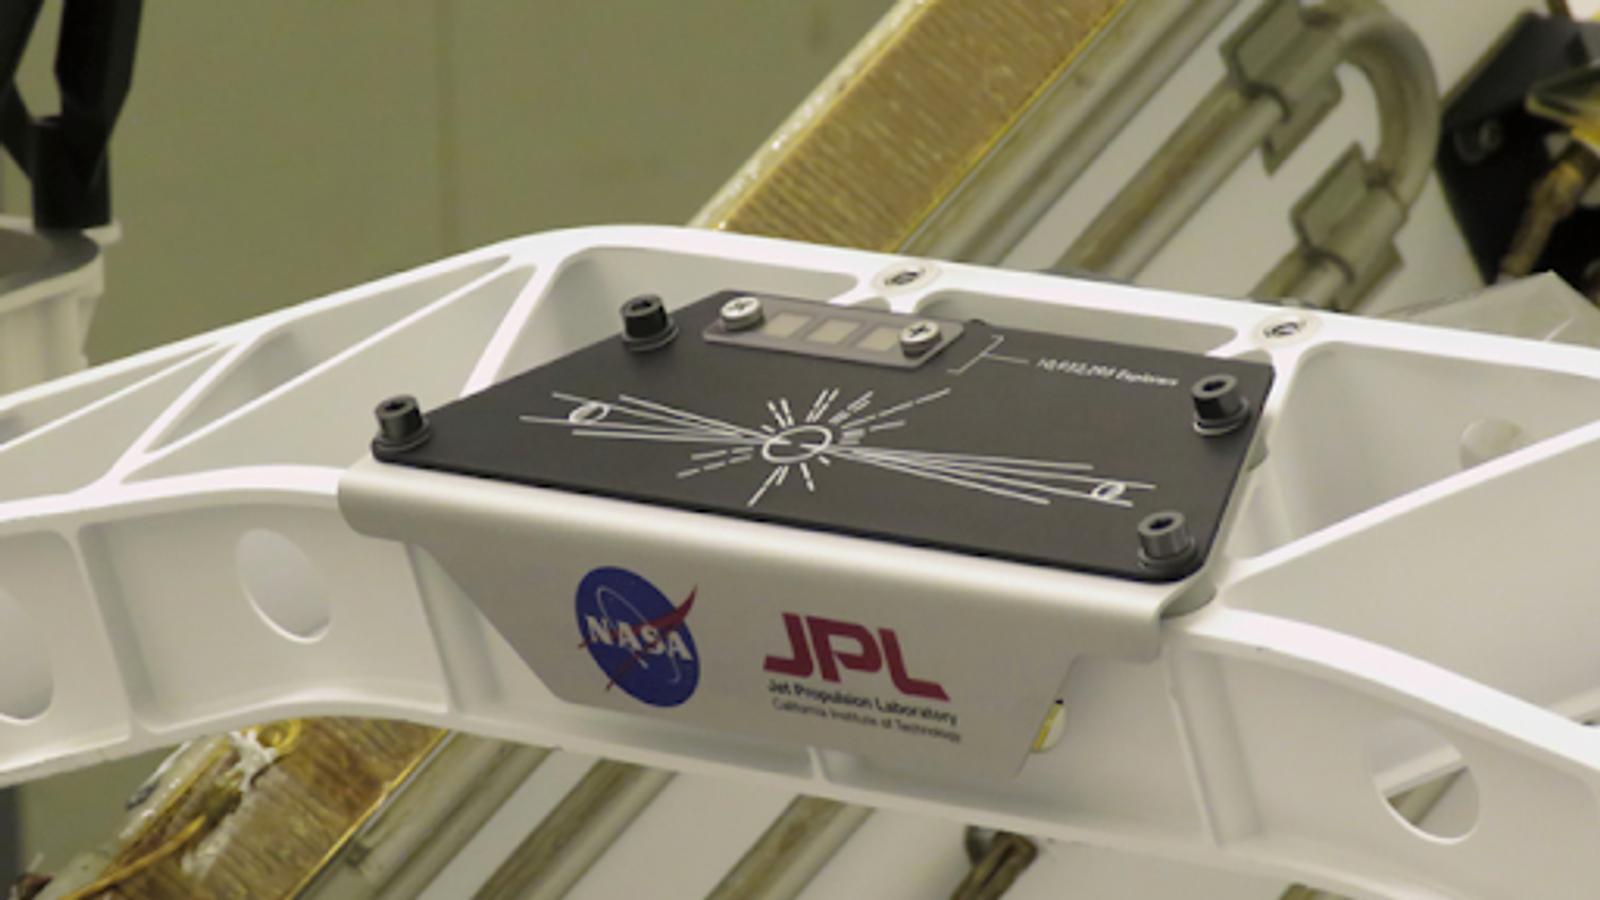 Perseverance: NASA's rover takes 11 million earthling names to Mars